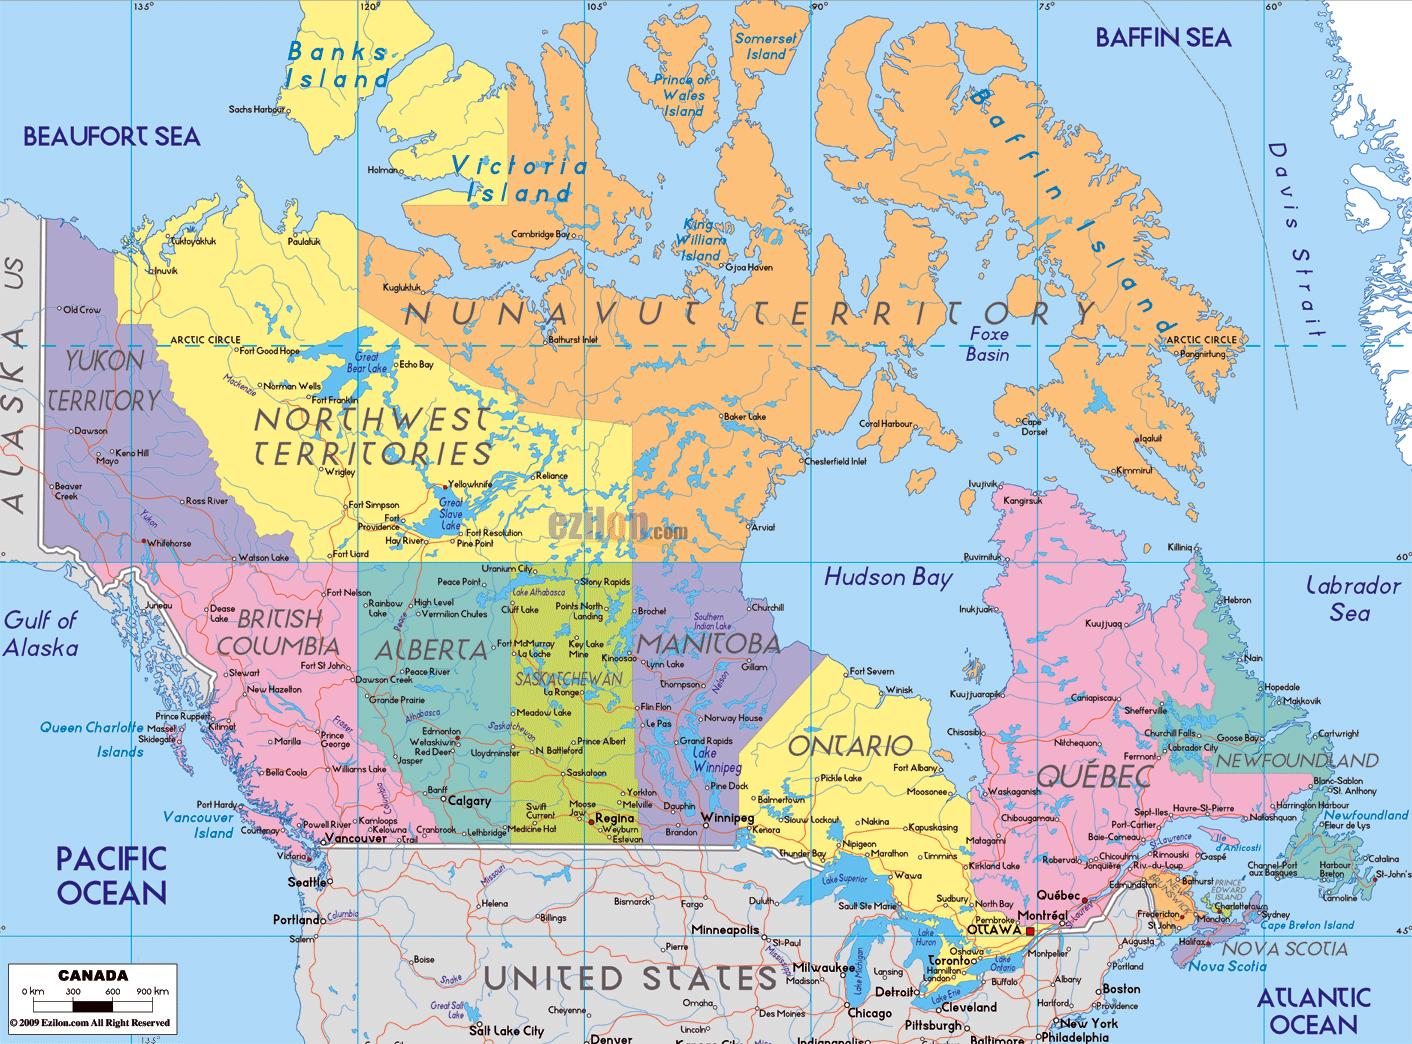 Canada Kort Med Bynavne Detaljeret Kort Over Canada Med Byer